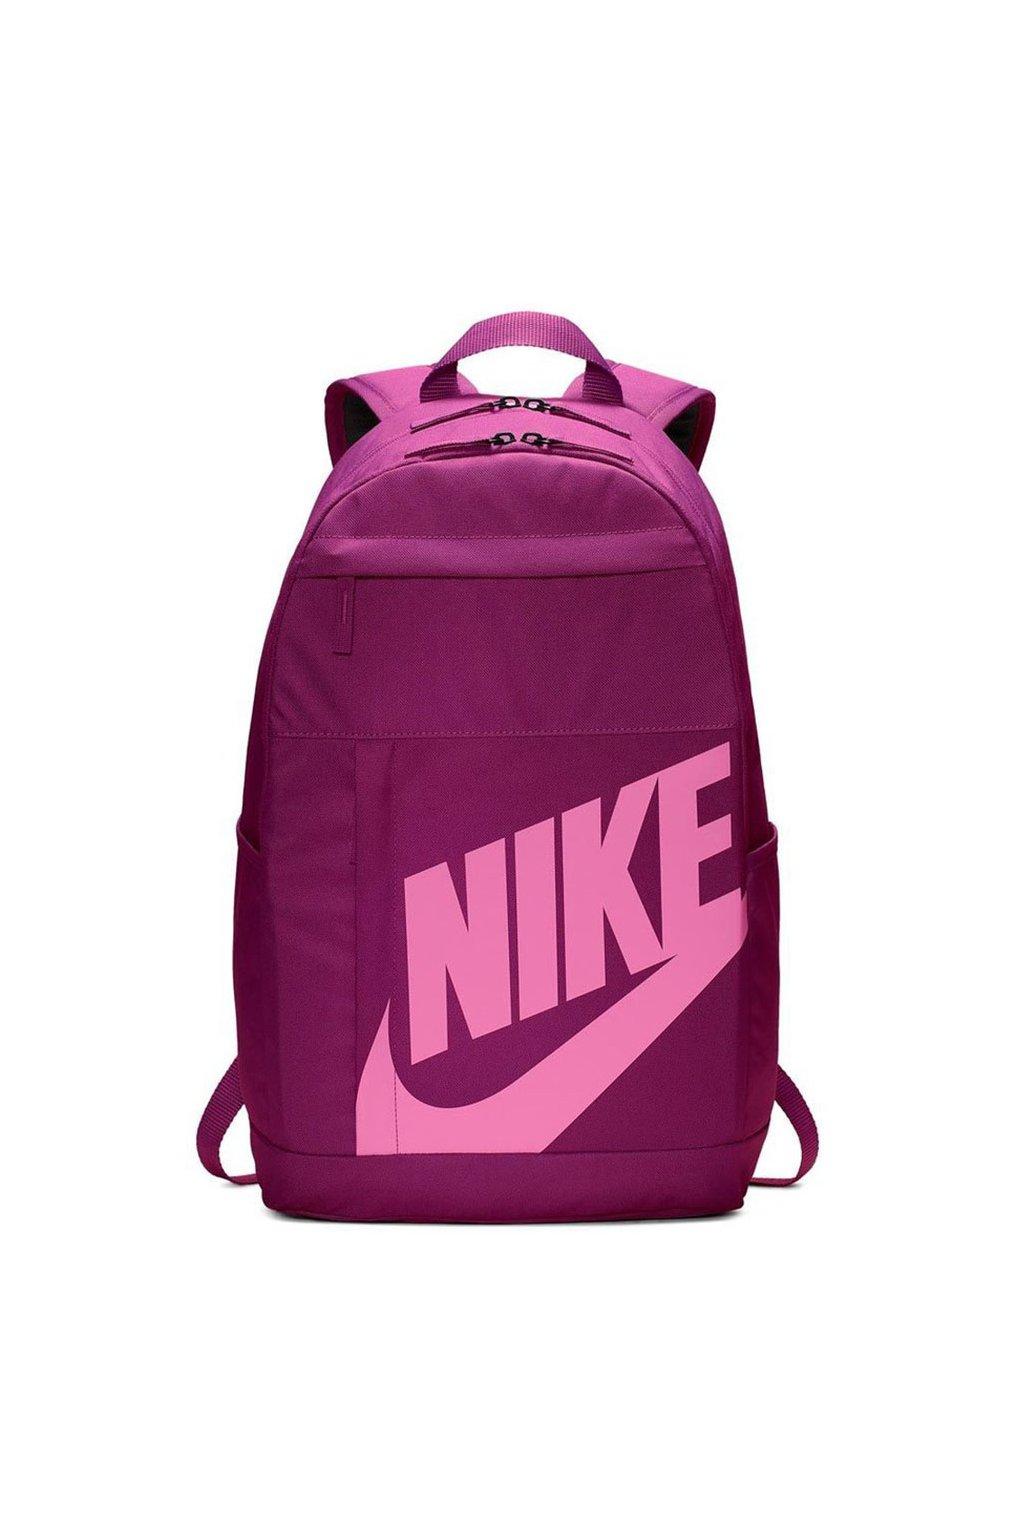 Batoh Nike Elemental 2.0 ružový BA5876 564